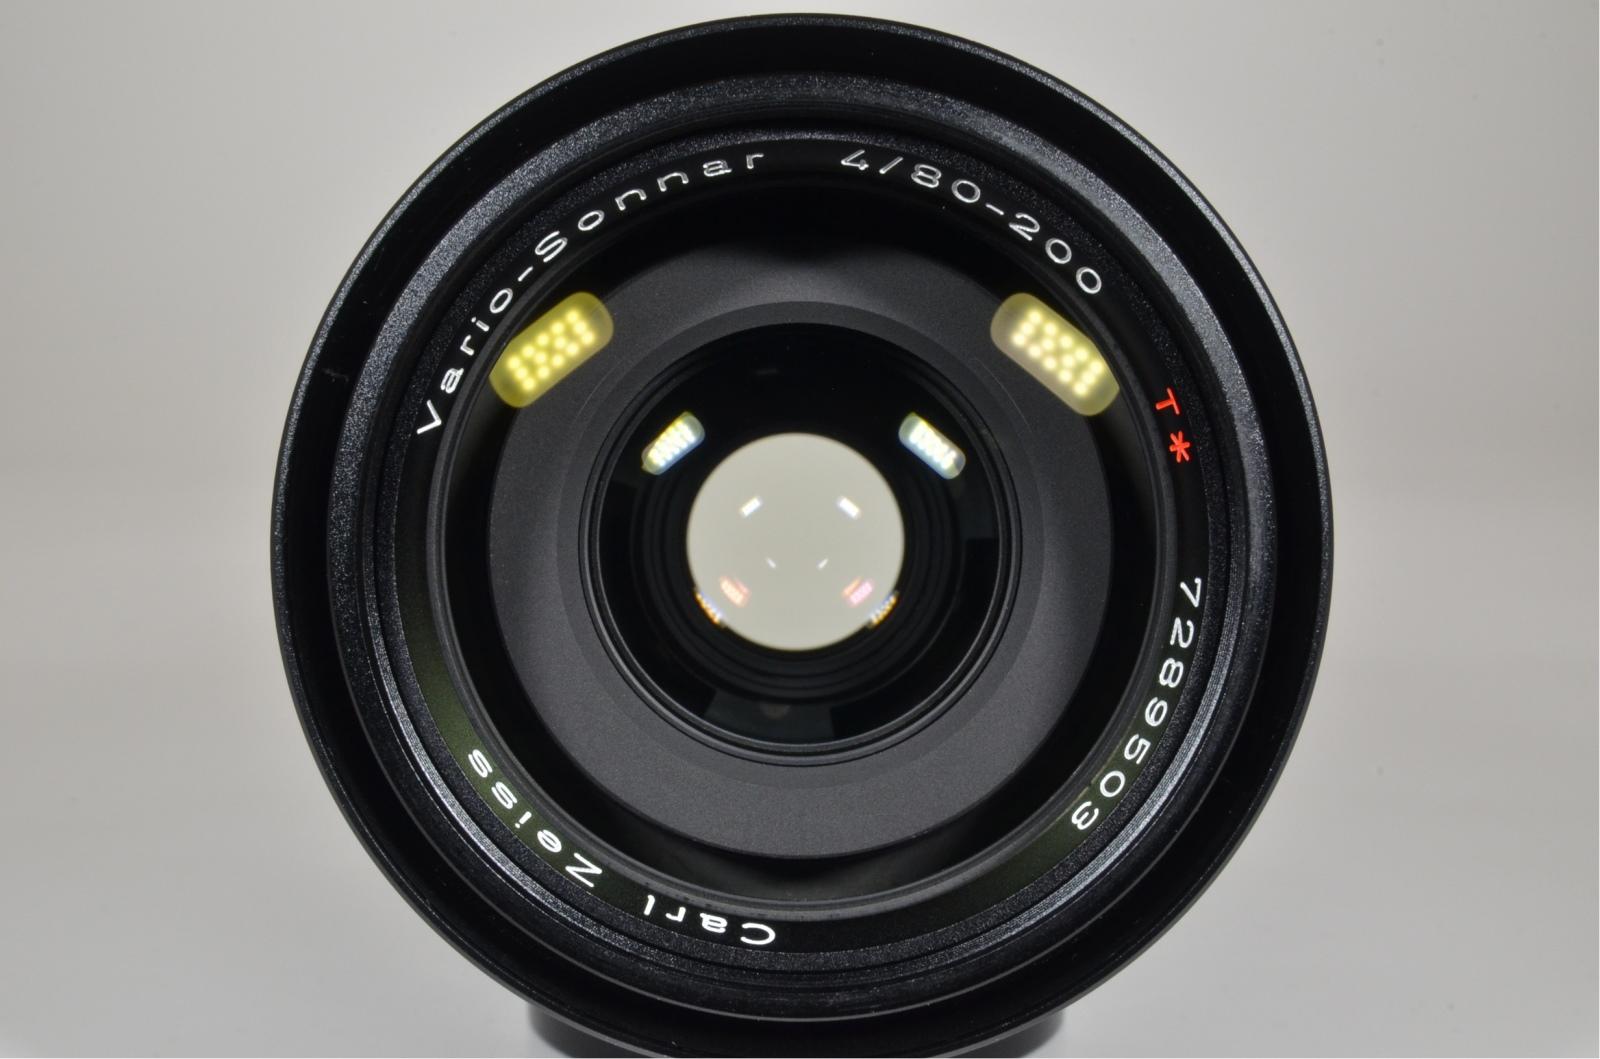 contax carl zeiss t* vario-sonnar 80-200mm f4 mmj c/y mount